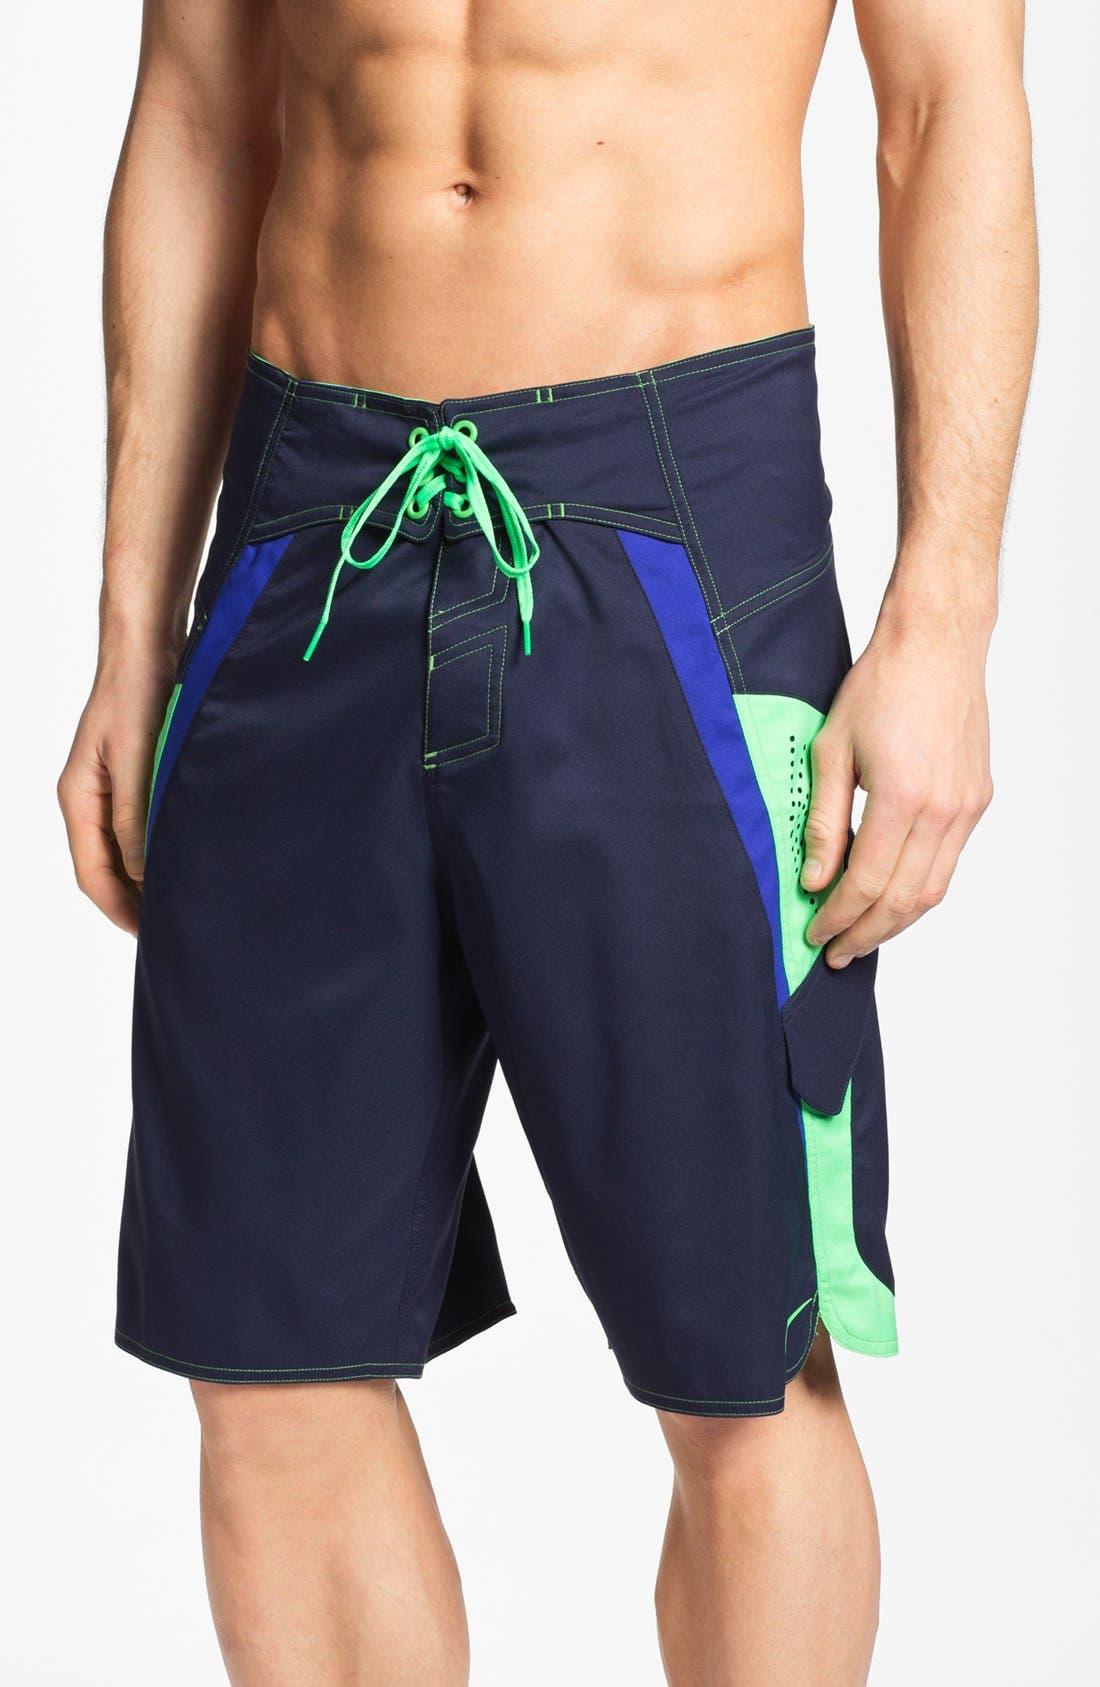 Alternate Image 1 Selected - Nike Board Shorts